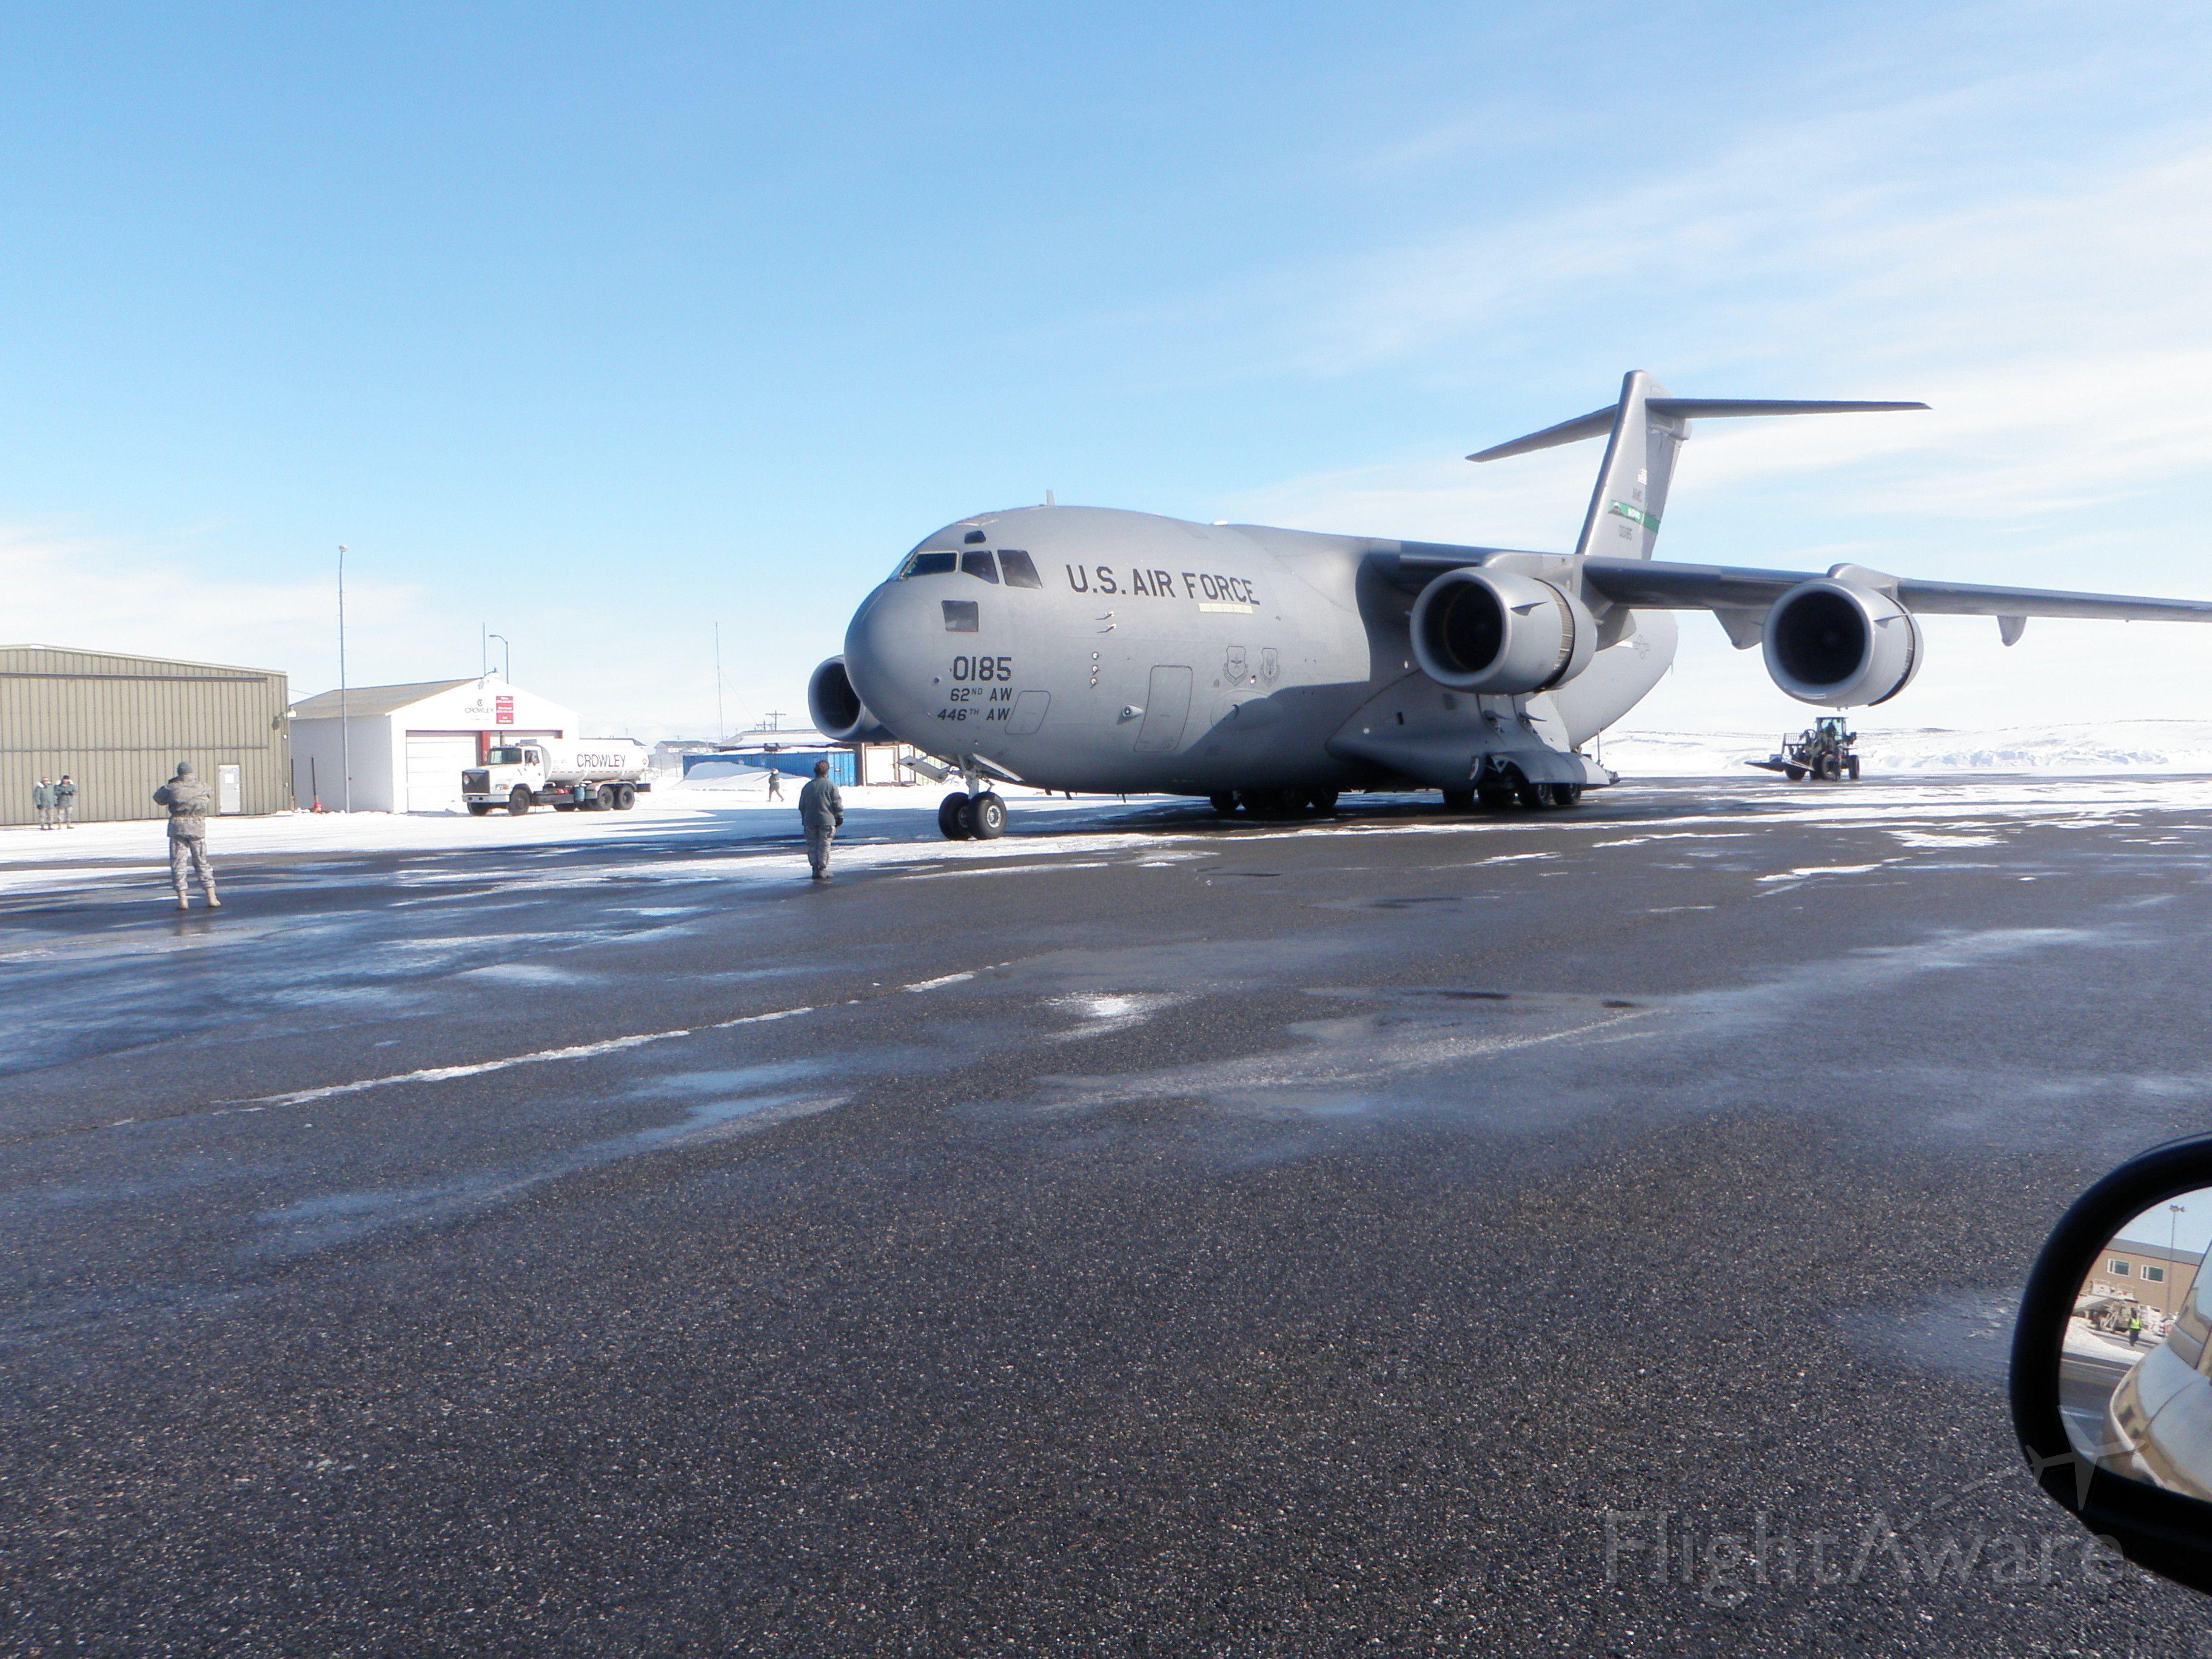 0185 — - C 17 on the tarmac in Kotzebue Alaska 04.18.2010